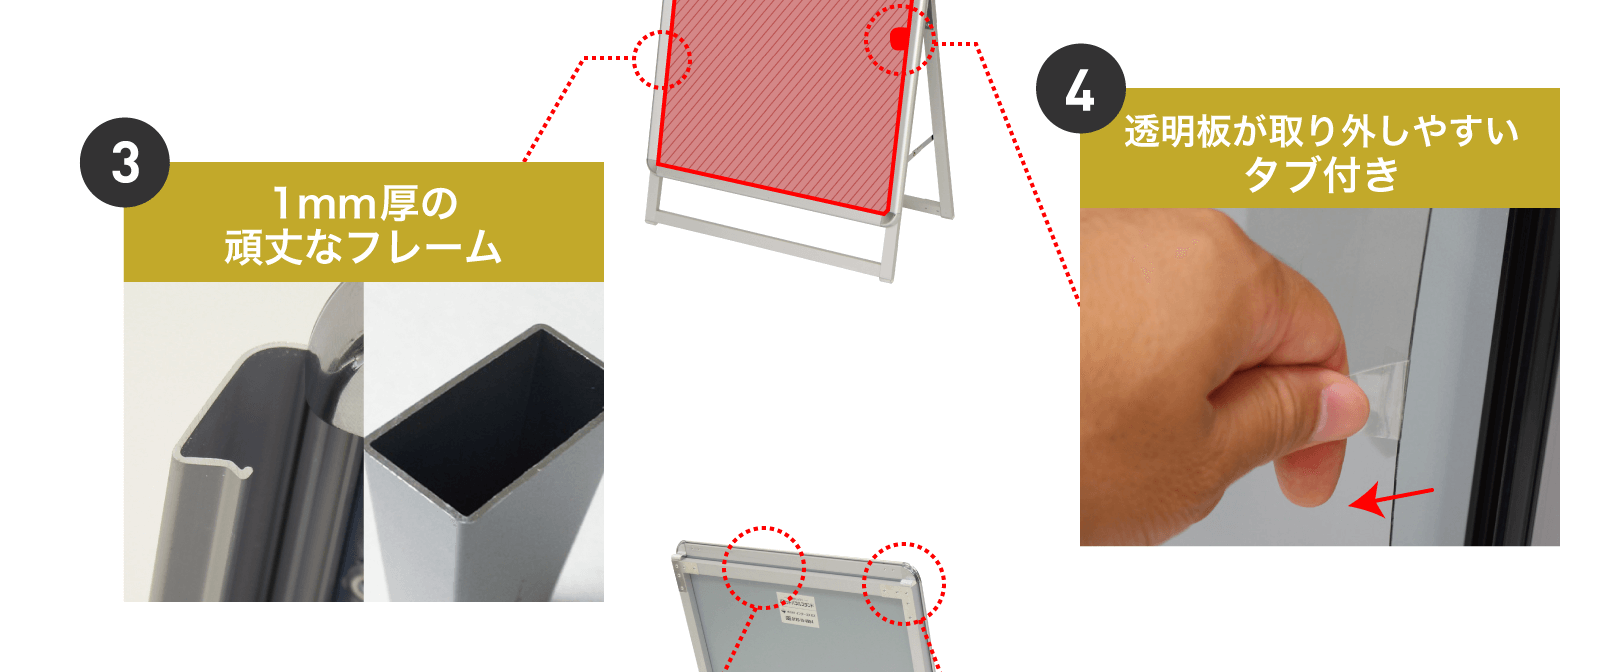 3.1mm厚の頑丈なフレーム/4.透明板が取り外しやすいタブ付き